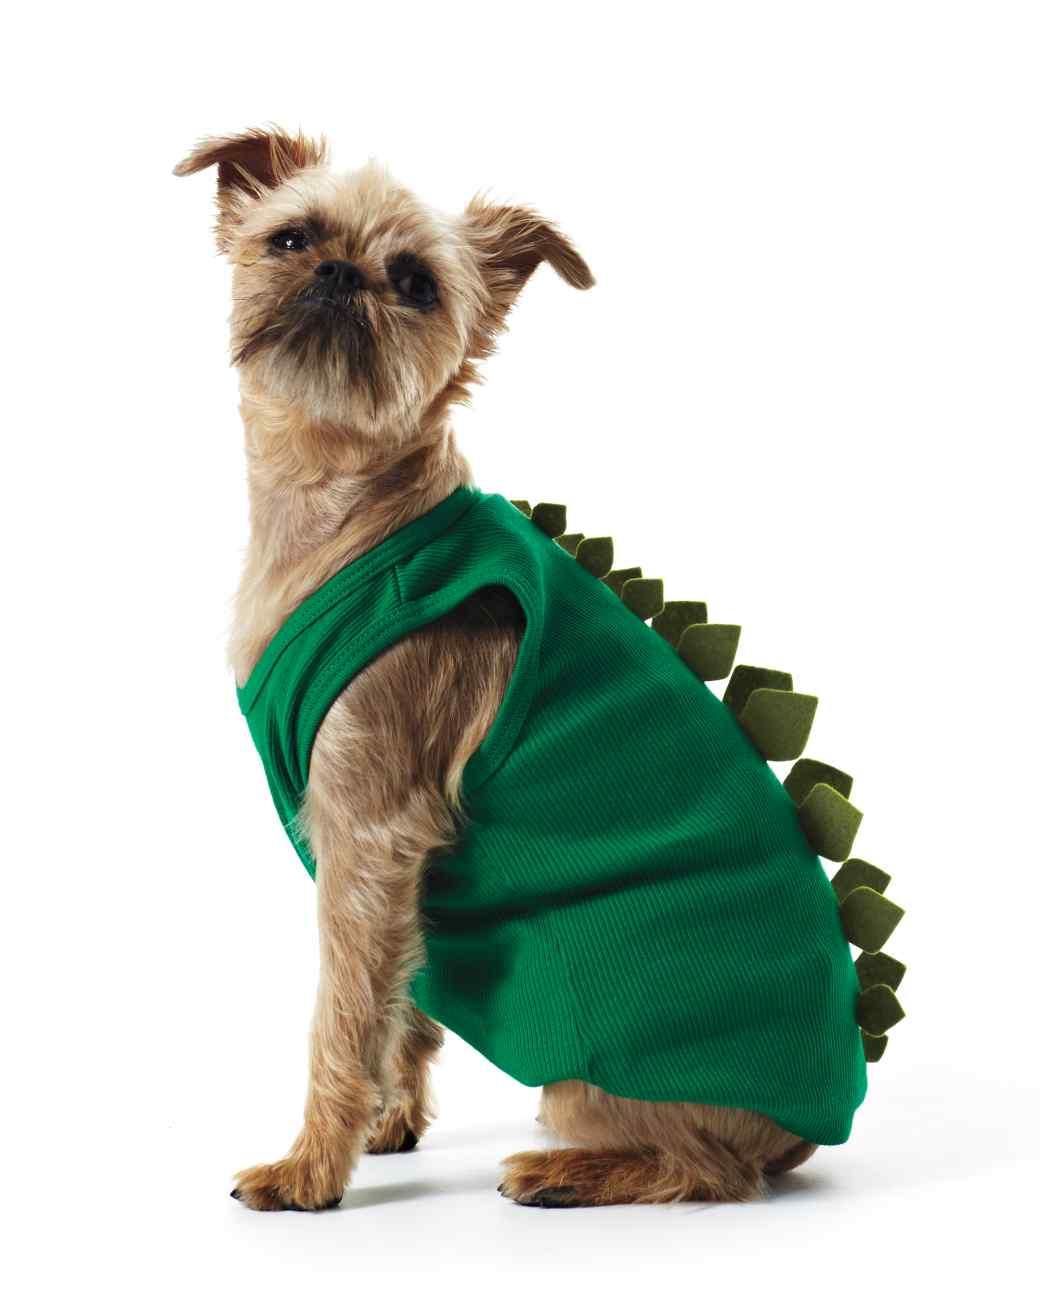 Martha Stewart Shows How To Make A Doggie Dino Costume